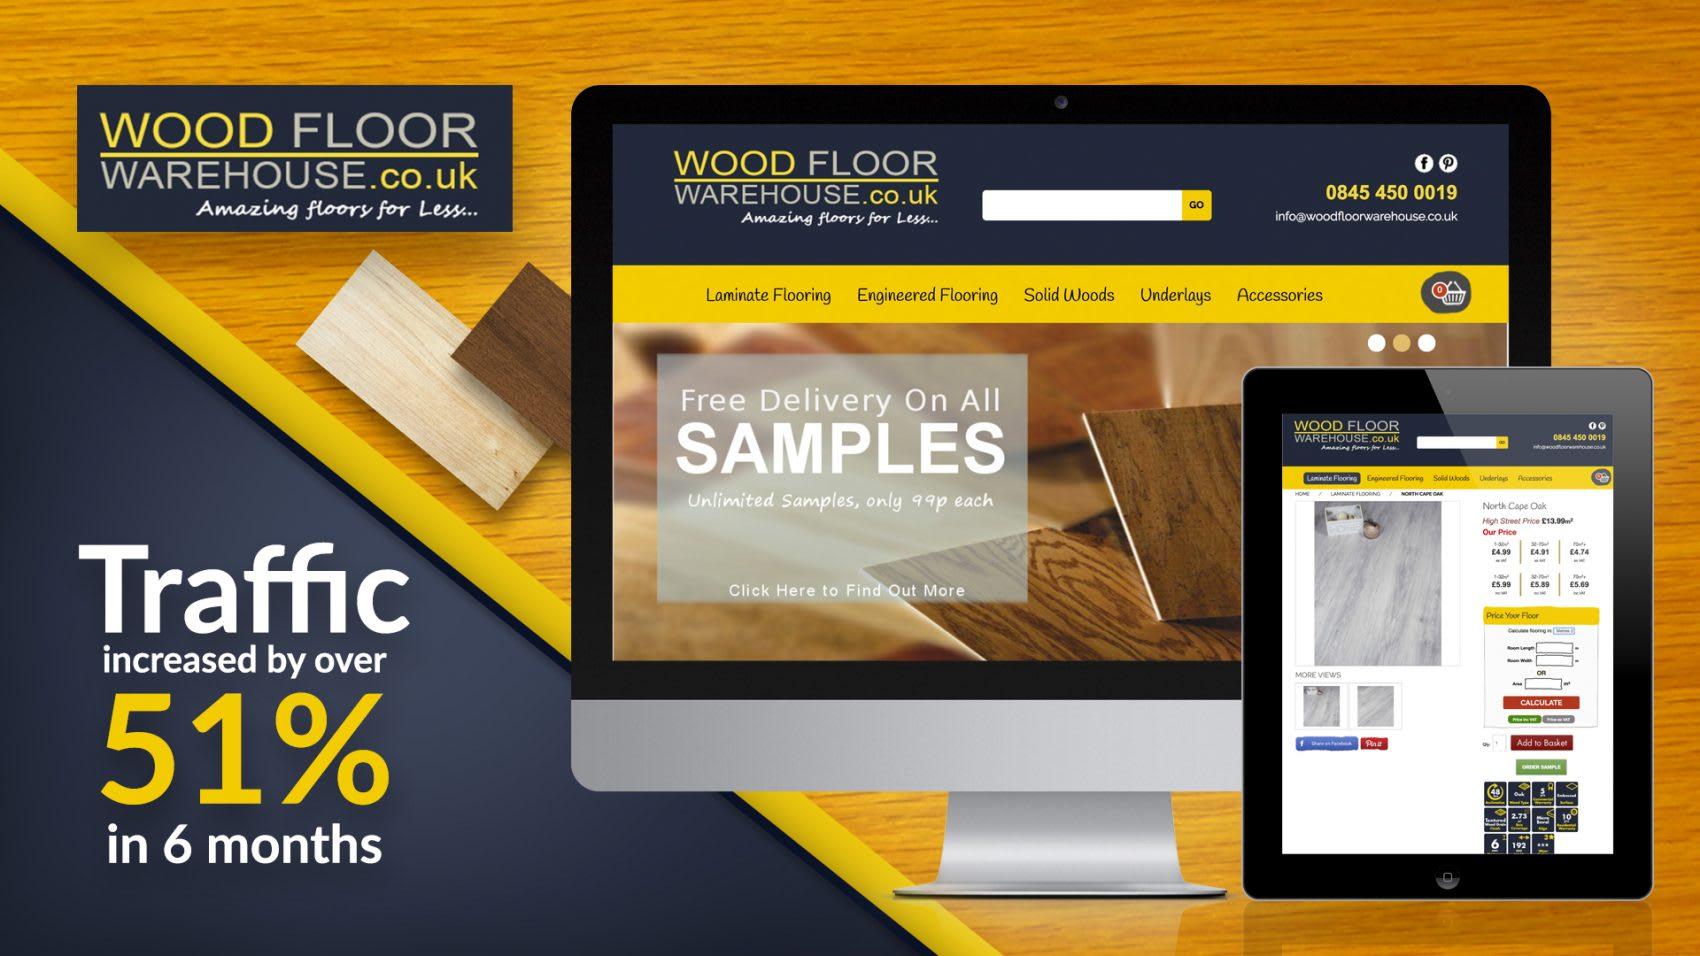 woodfloor warehouse seo results